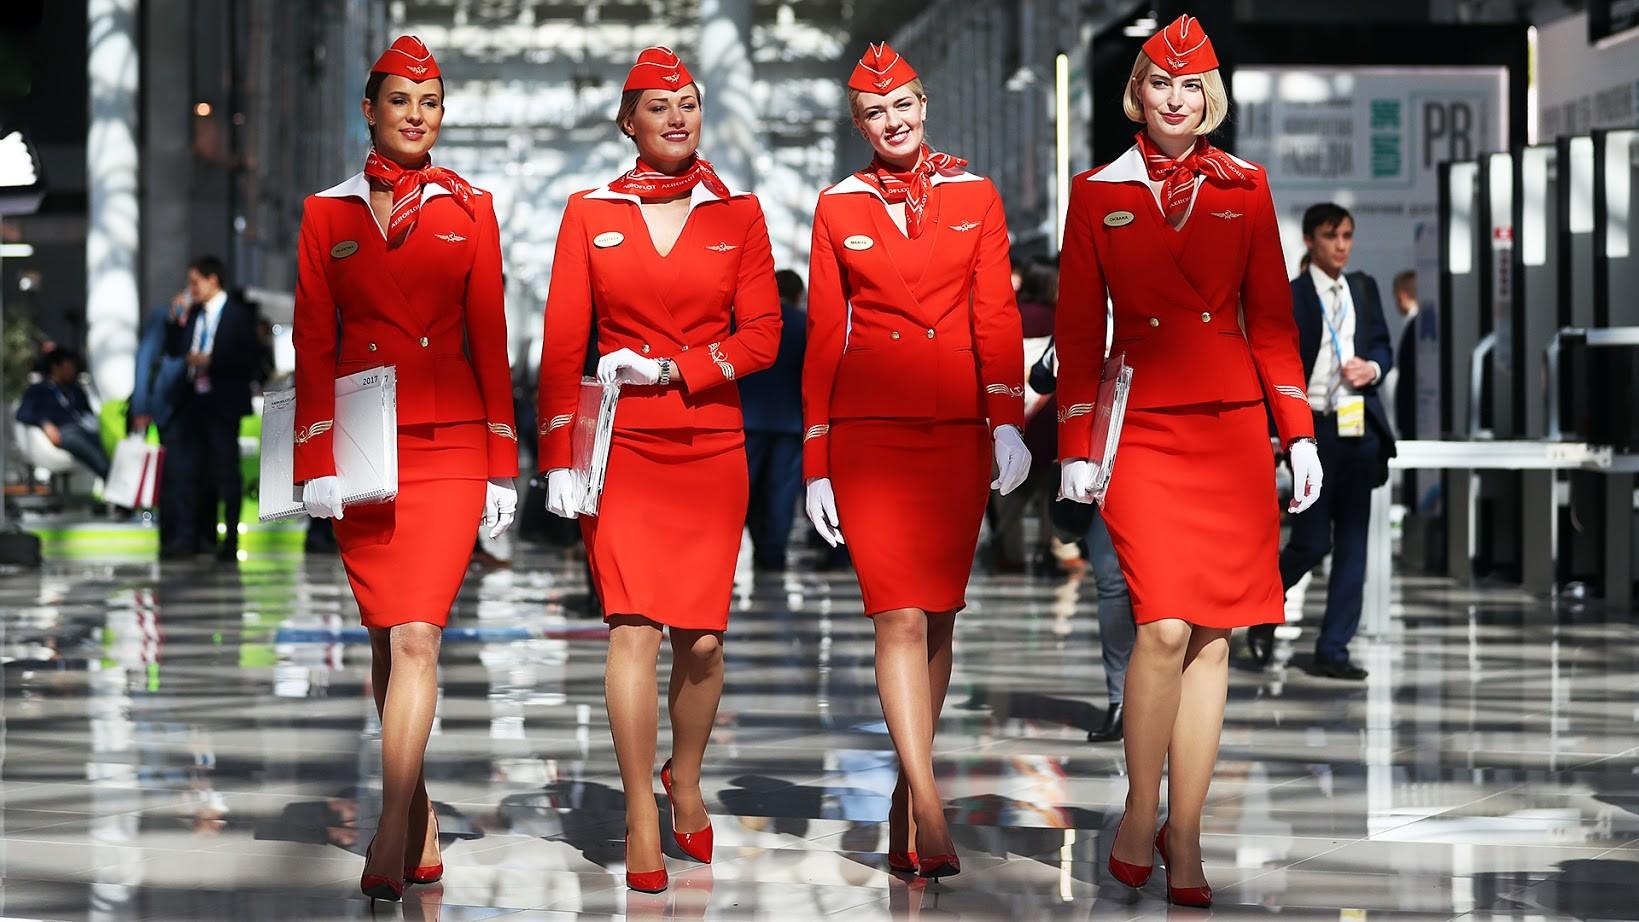 Stevardese Aeroflota na Ruskem investicijskem forumu 2017.